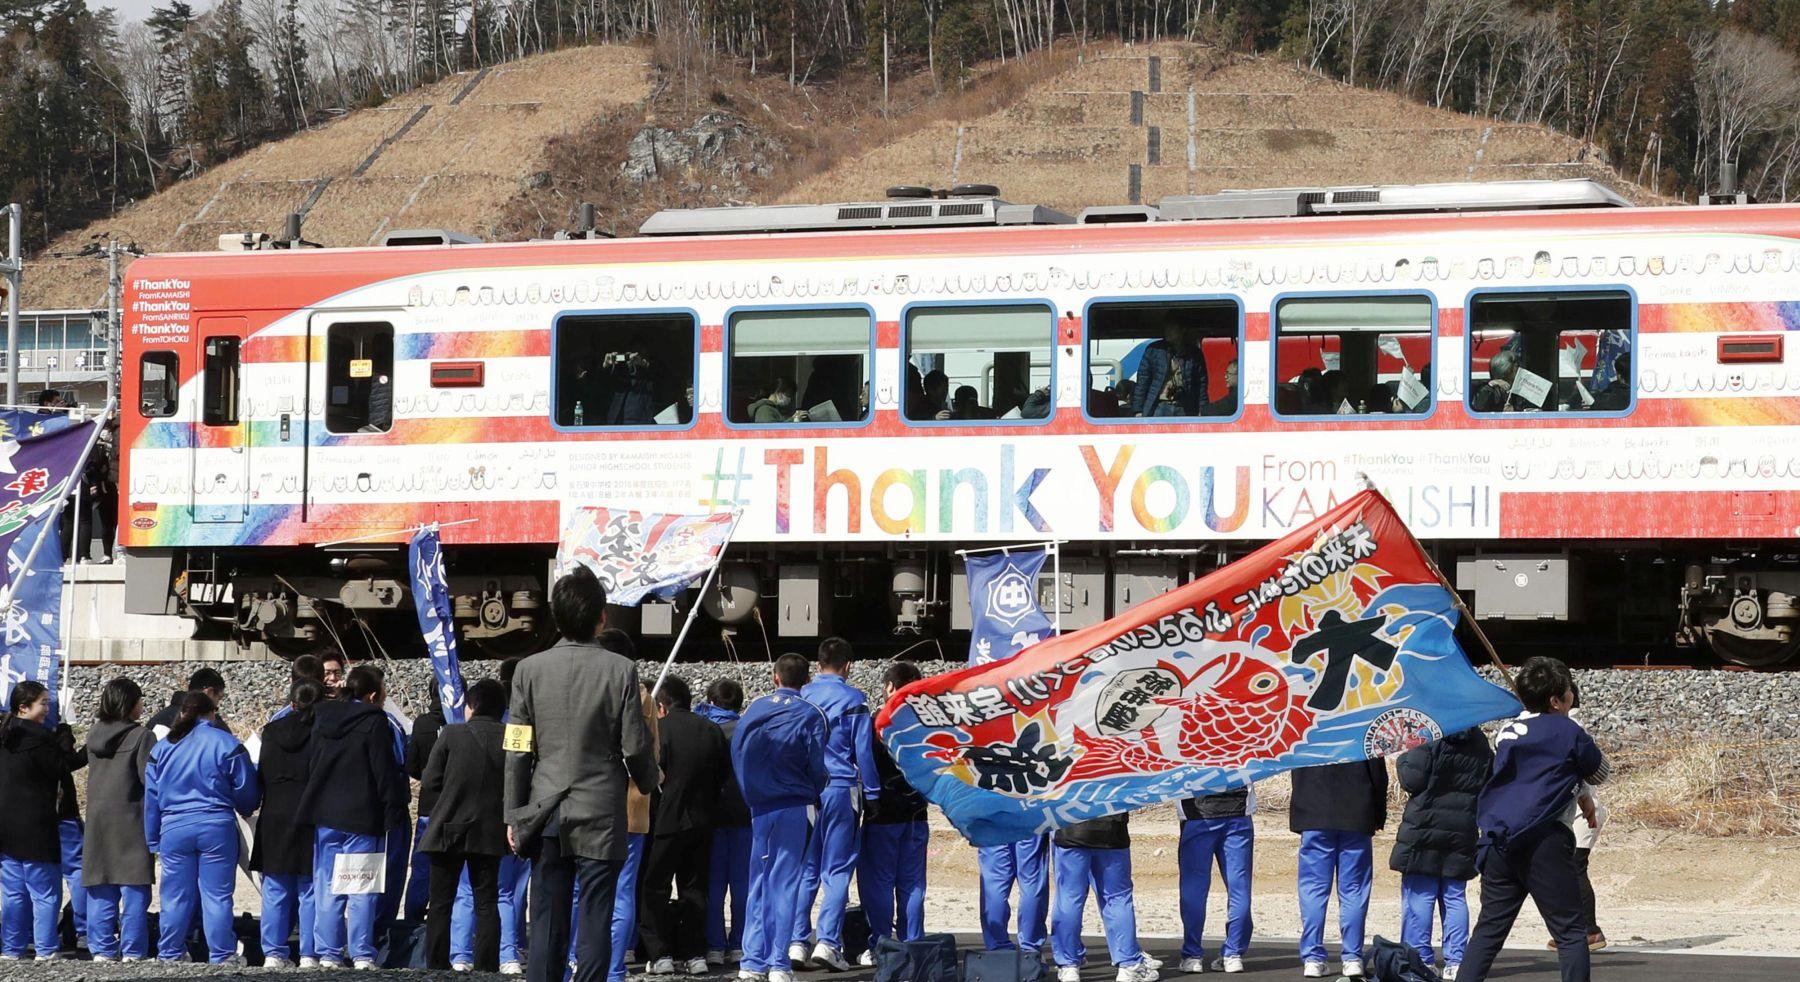 Japan Tsunami-Hit Sanriku Railway In Tohoku Resumes Full Operations After 8 Years 005